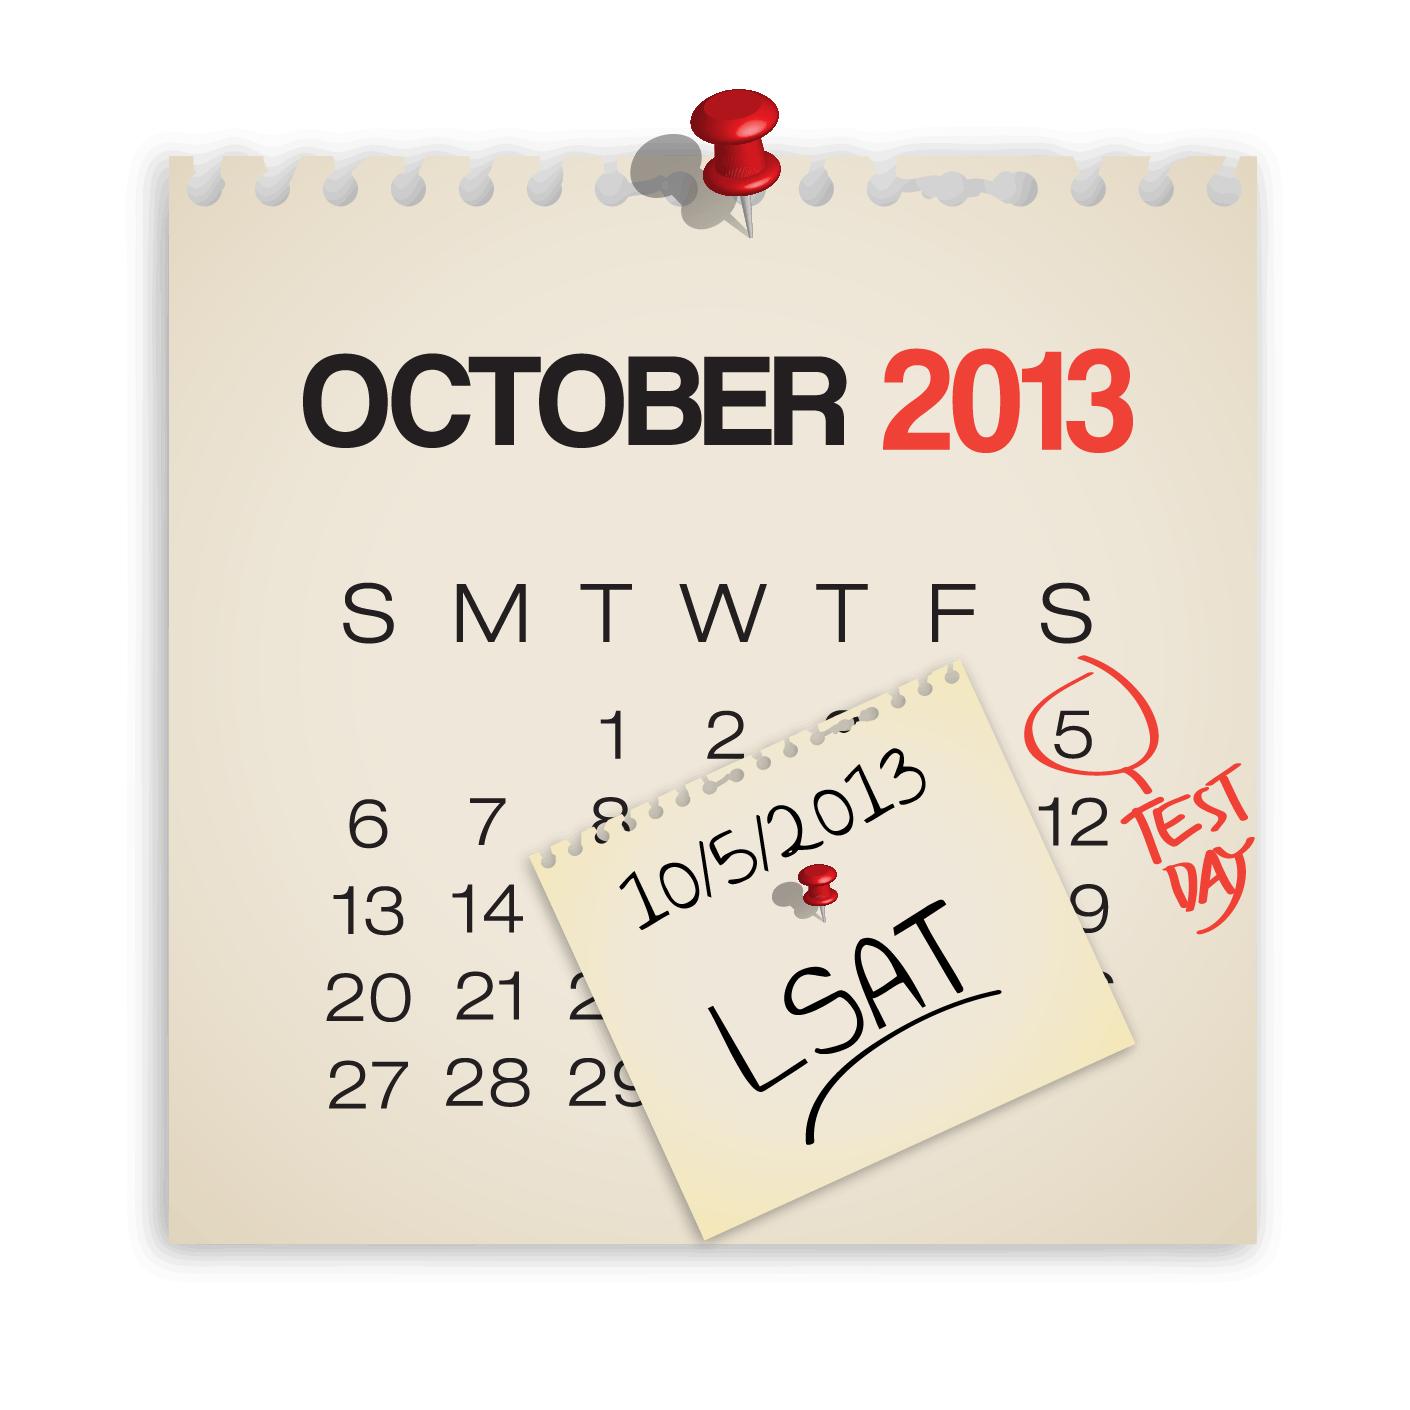 October lsat scores released today 10282013 vent here lawschooli october lsat scores released today 10282013 vent here geenschuldenfo Choice Image